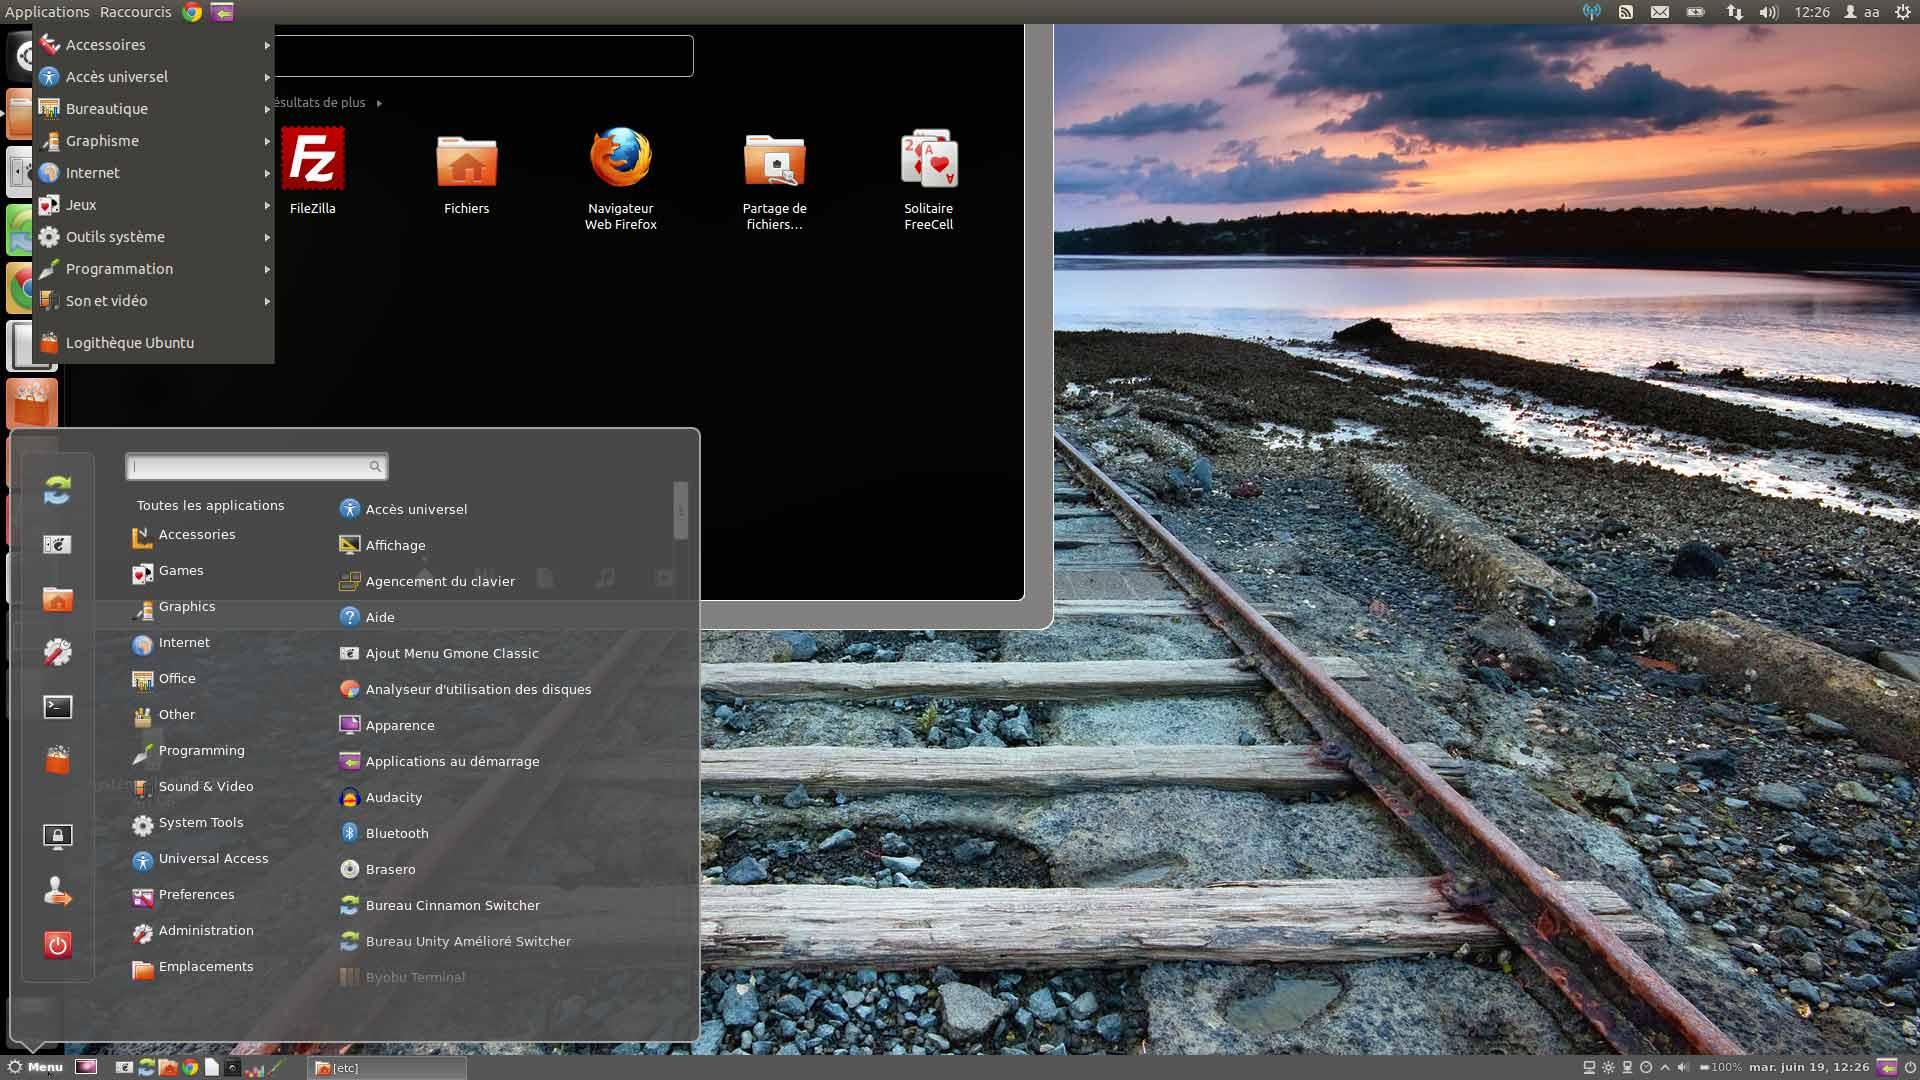 Cubuntu Ubunru avec Gnome + Cinnamon + Unity , ensemble et permutable a chaud !